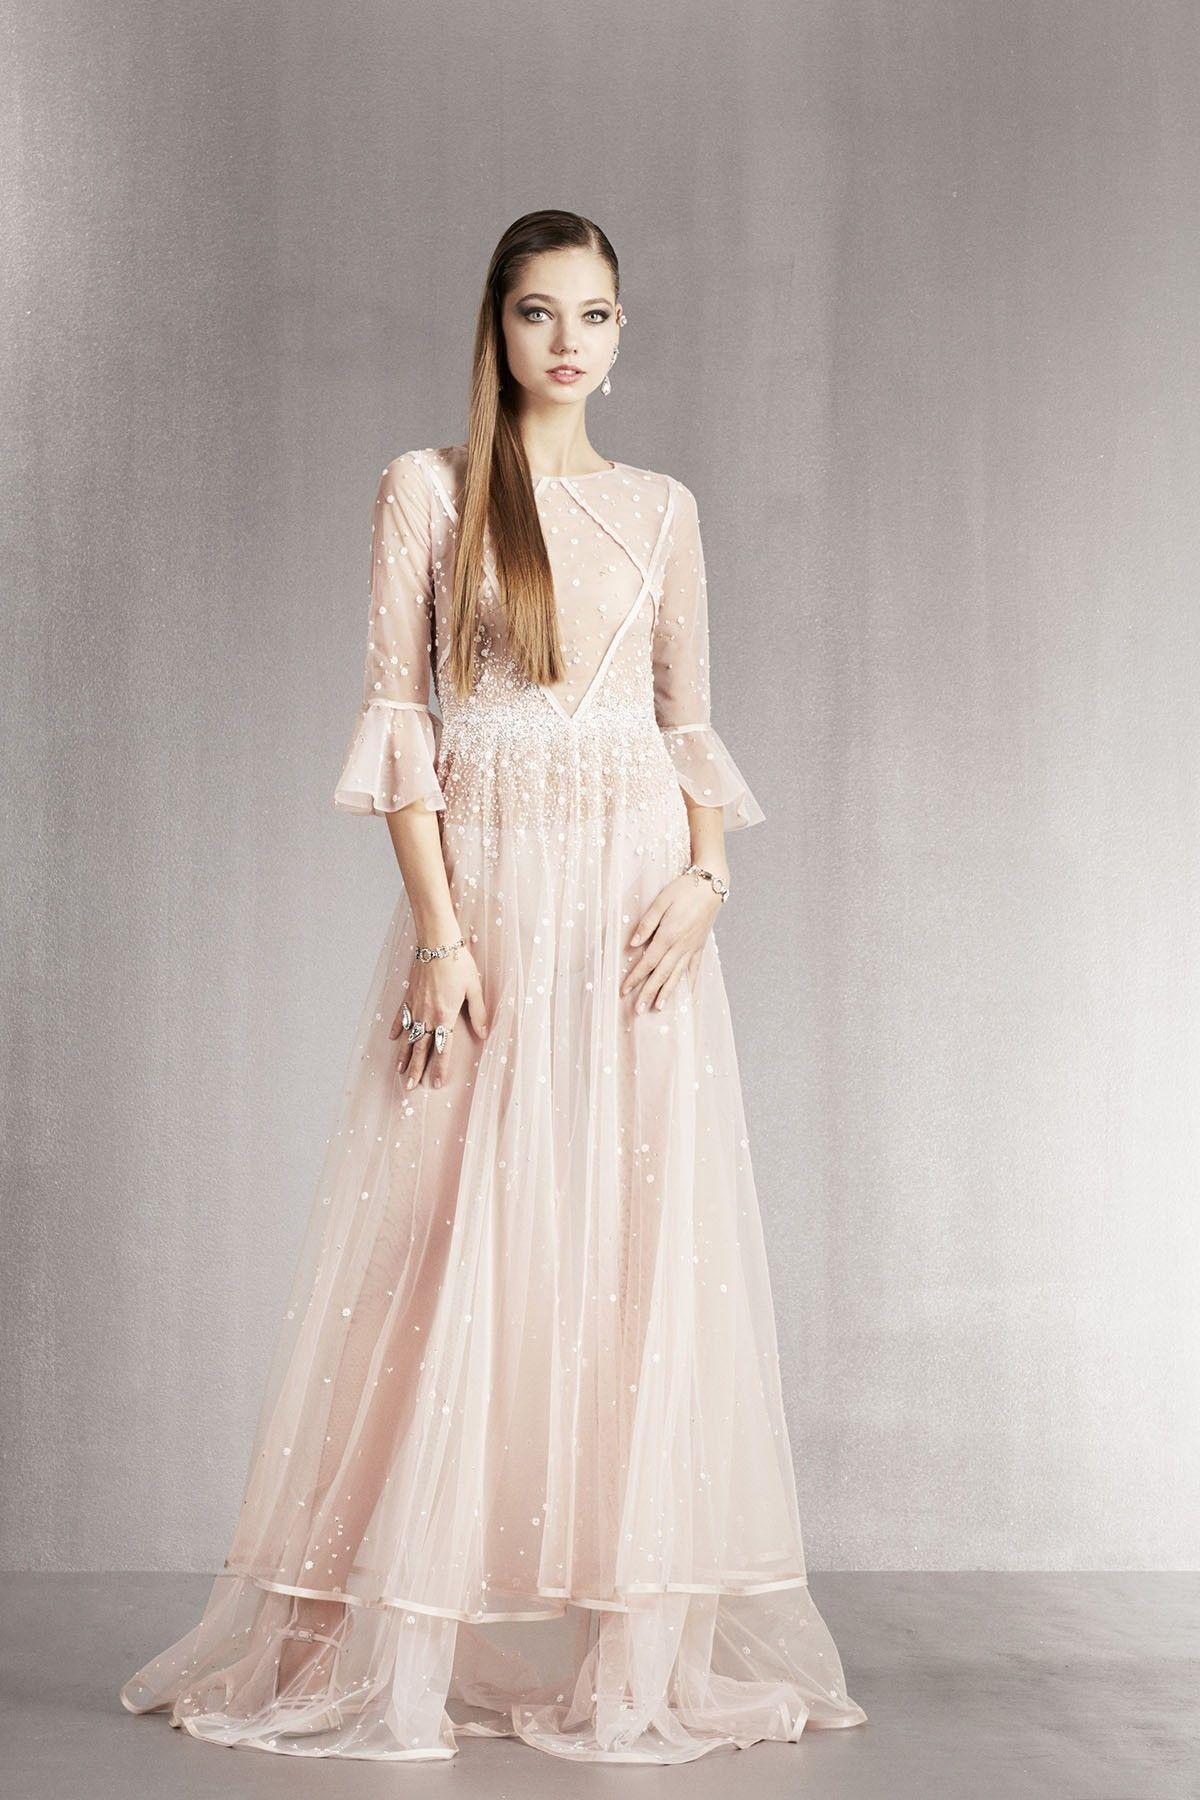 2018 Spring Dance Dresses